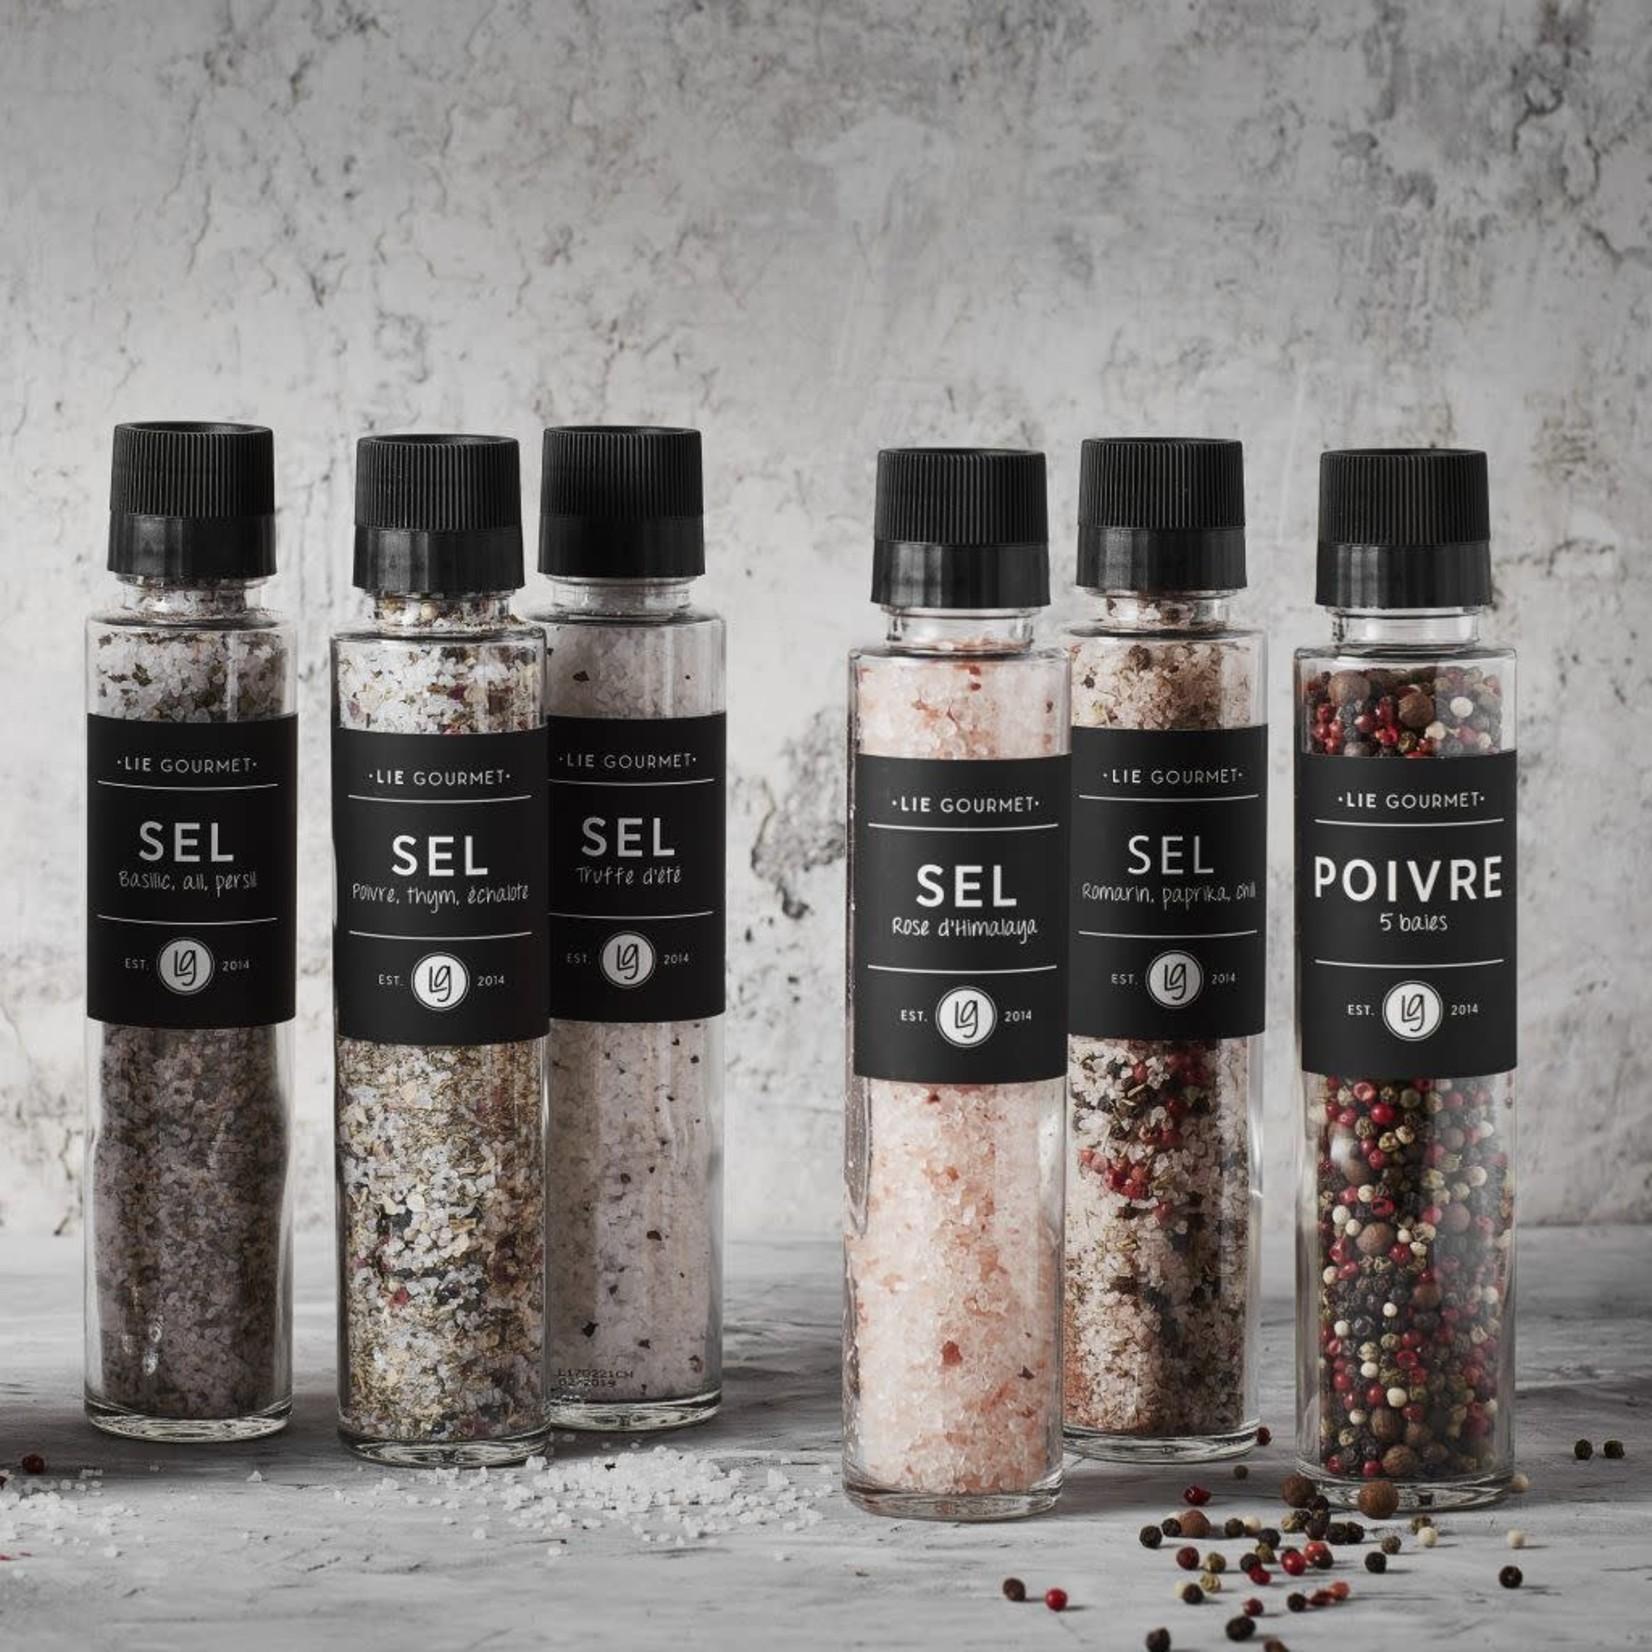 Lie Gourmet Lie Gourmet Salt rosemary, paprika, chili